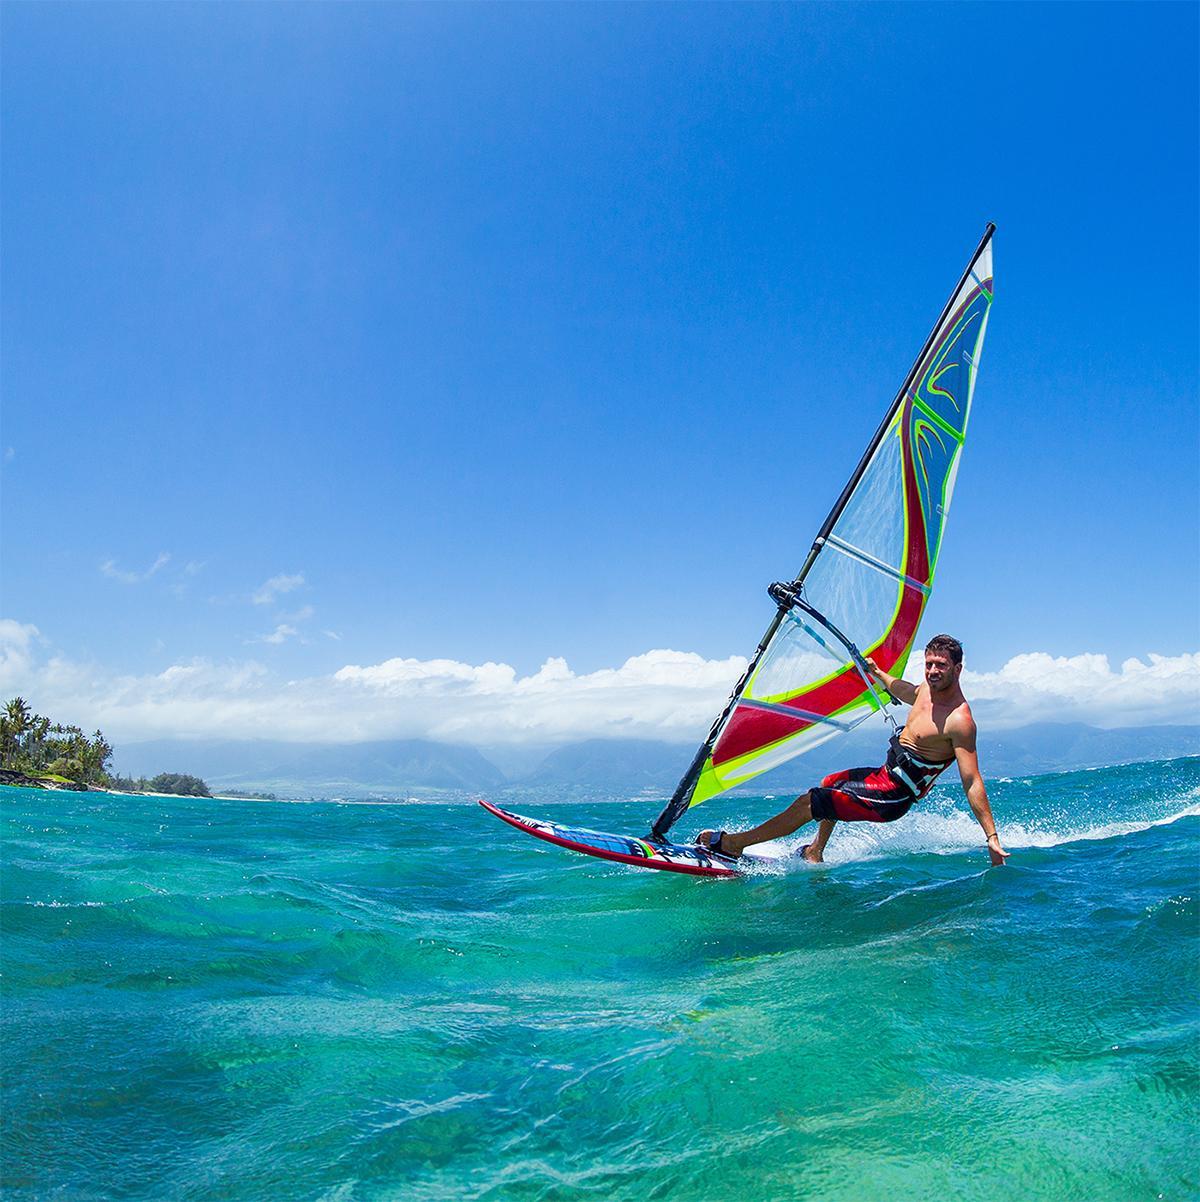 Windsurfing in Bonaire